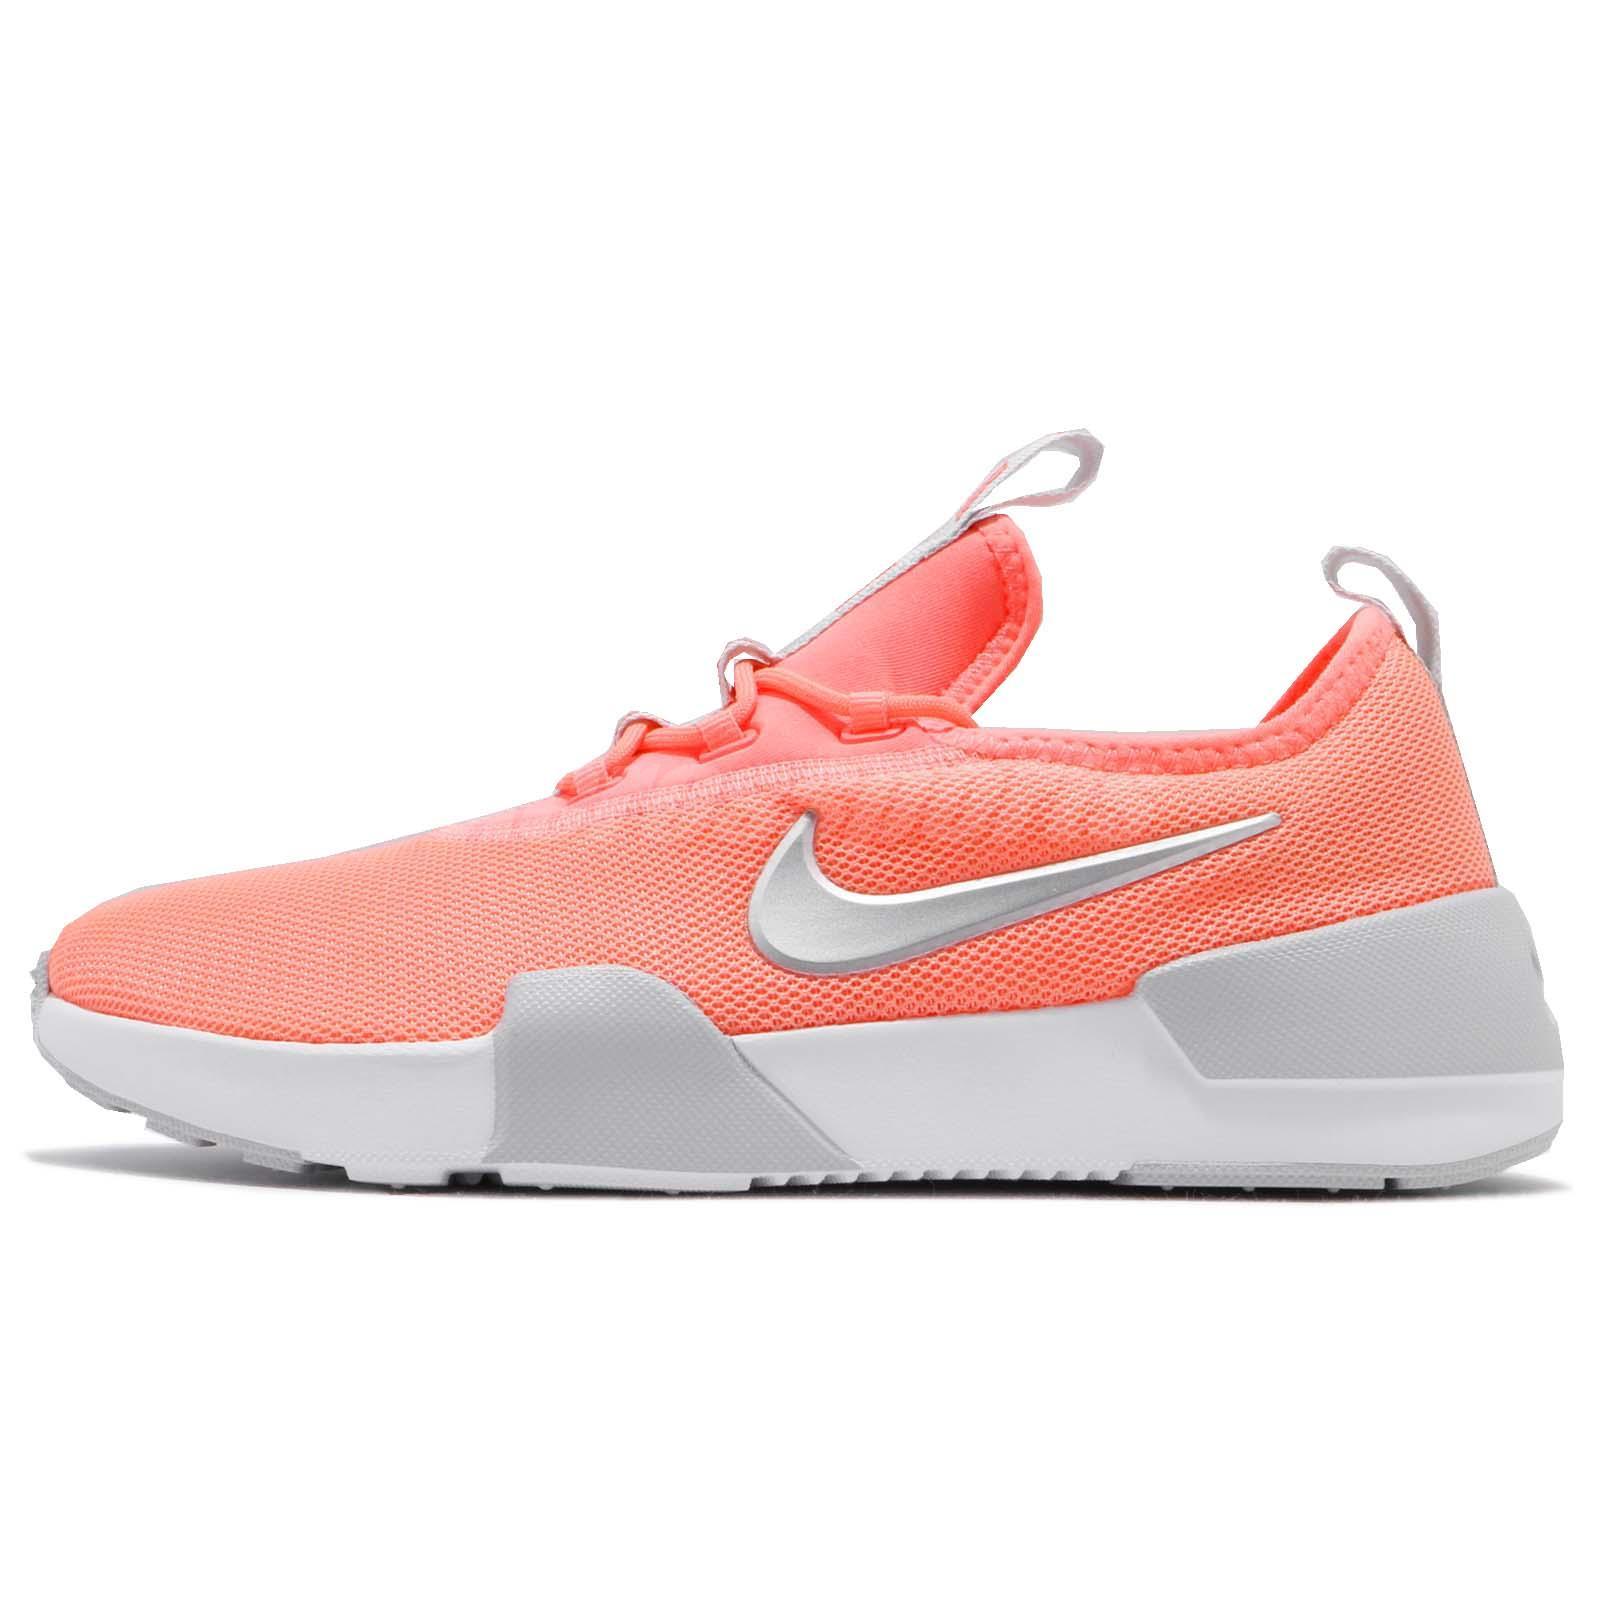 Estricto precio Menos  Nike Ashin Modern GS Pink Silver Kids Youth Women Running Shoes AO1686-600  | eBay